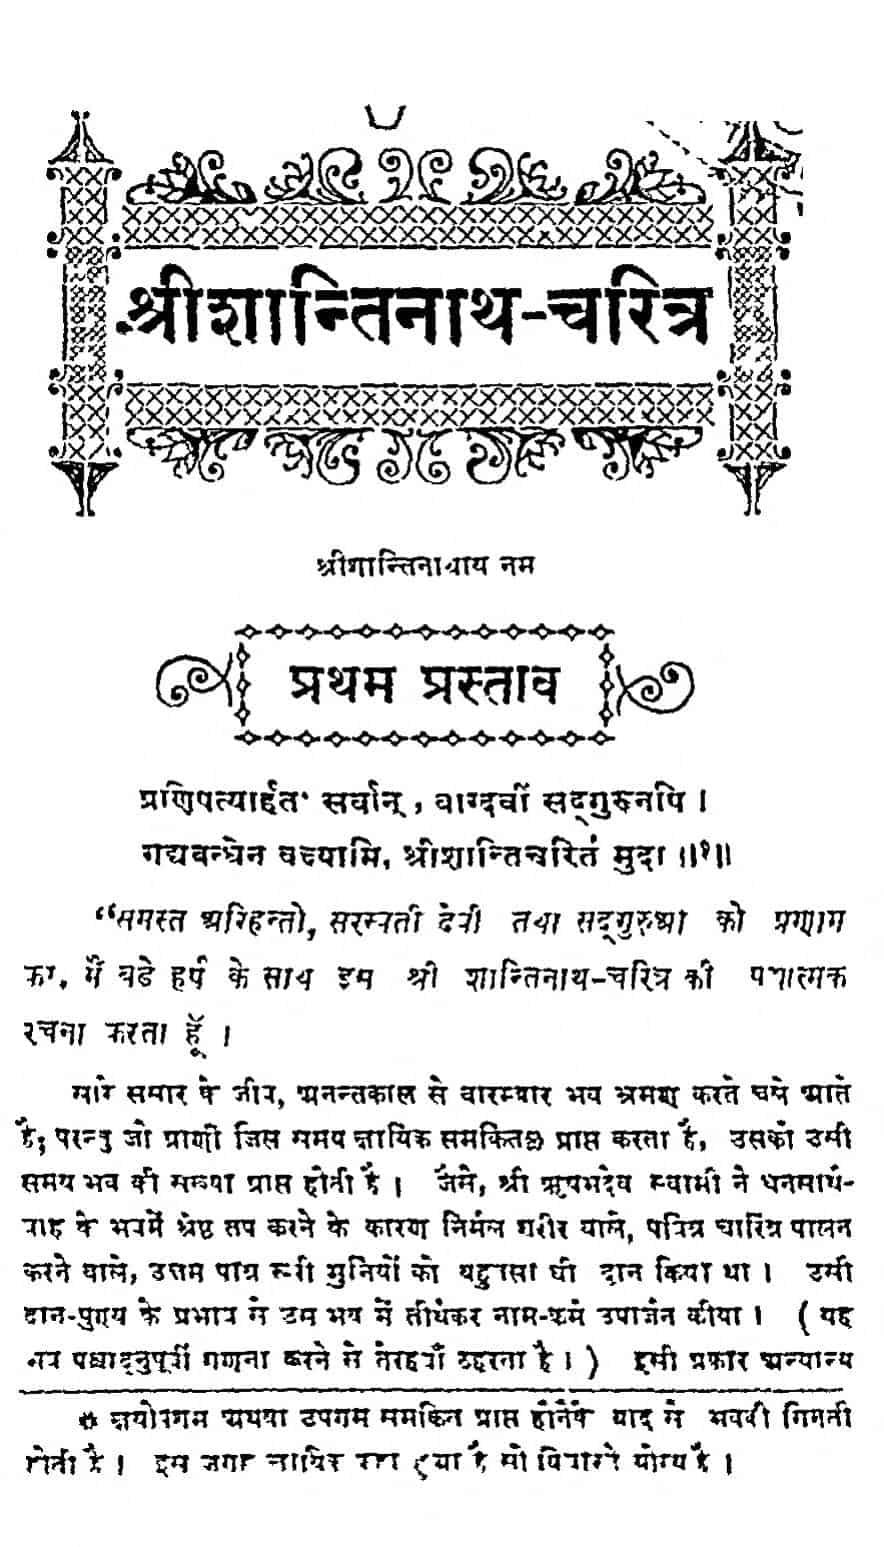 Book Image : श्री शान्तिनाथ चरित्र  - Shri Shantinath Charitra